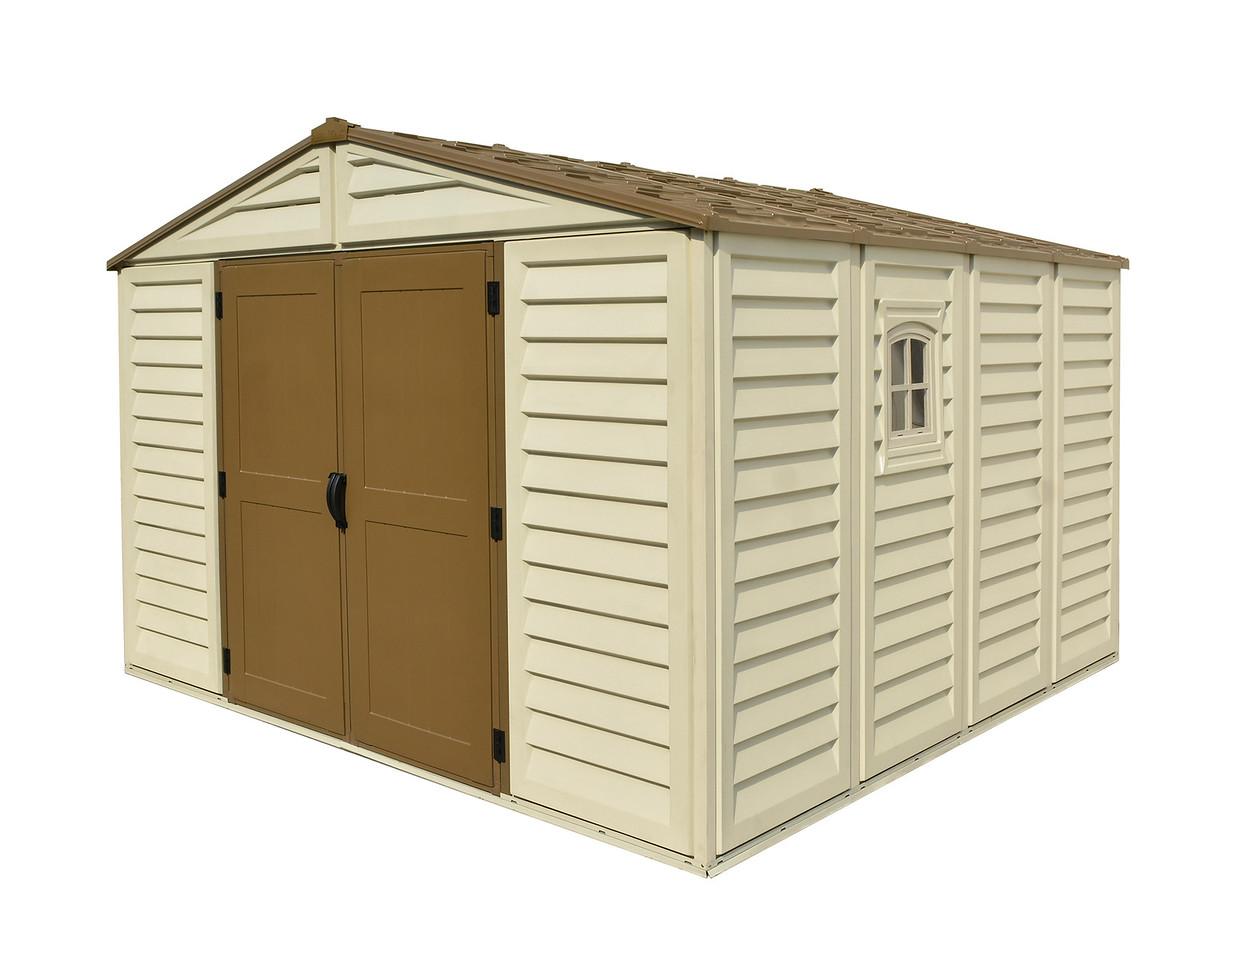 DURAMAX Zahradní domek Duramax WoodBridge Plus 10m2 + podlahová konstrukce (model 40224 -10x10´)